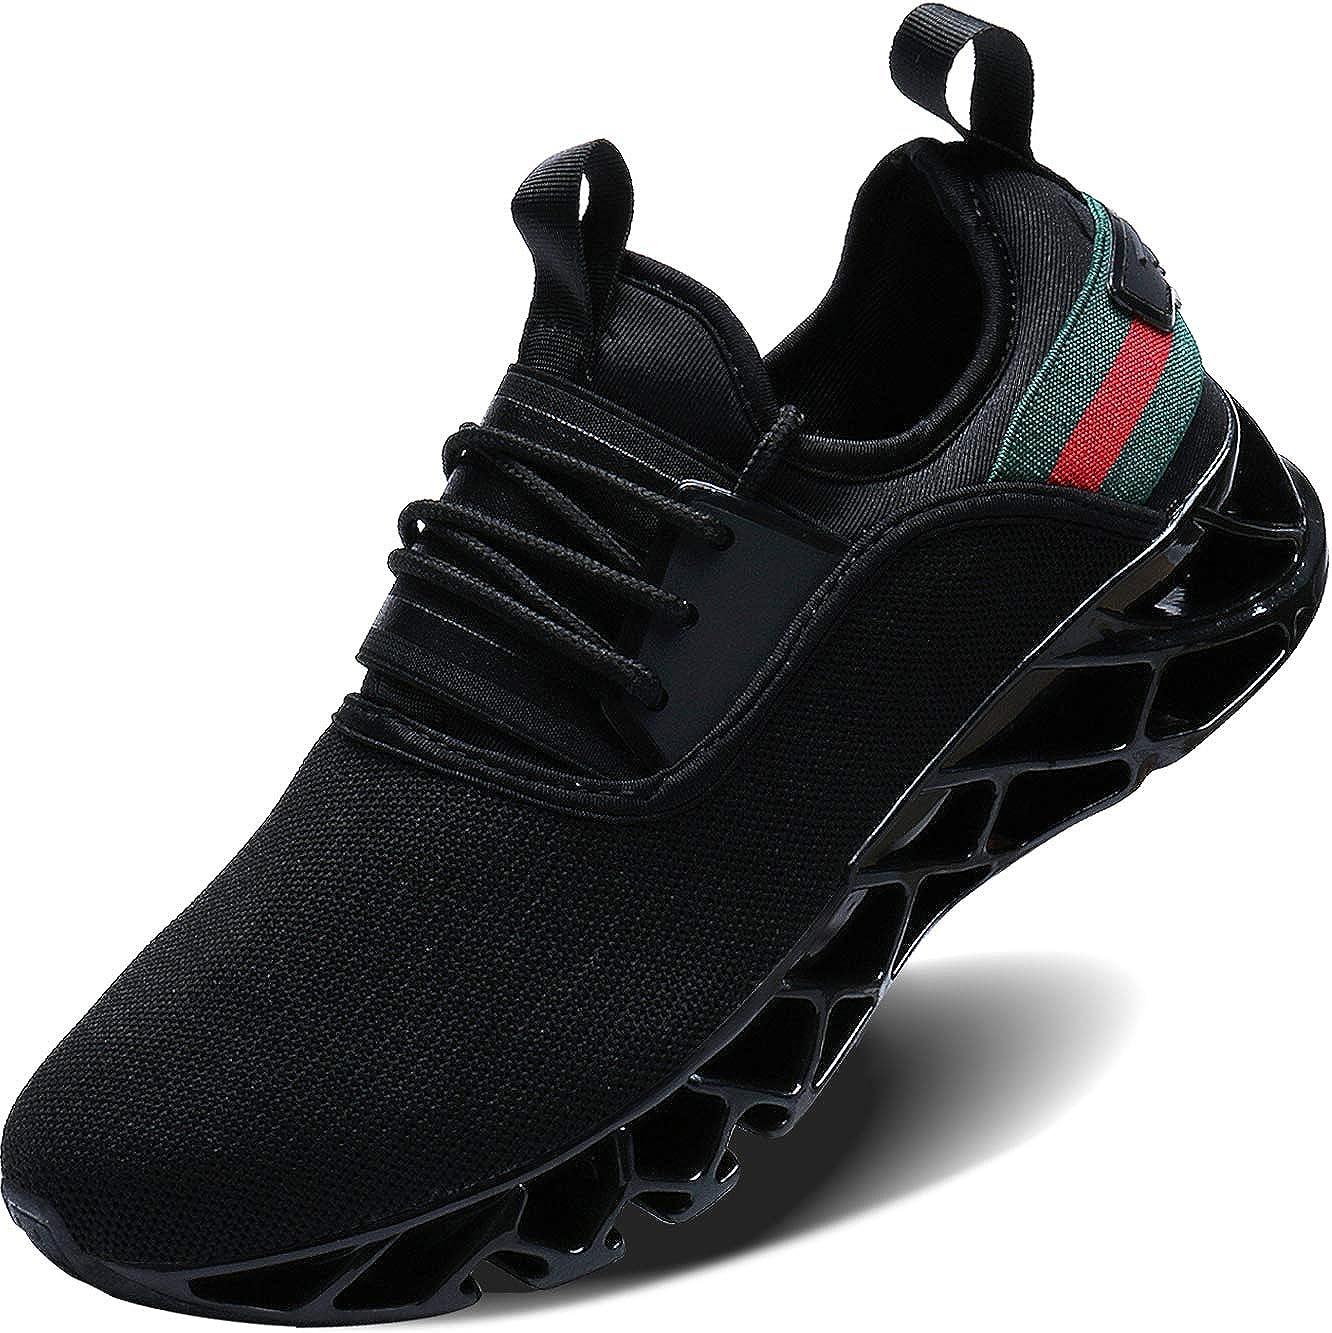 save off 729c2 51017 Amazon.com   Wonesion Mens Walking Tennis Shoes Blade Slip on Casual  Fashion Sneakers   Walking